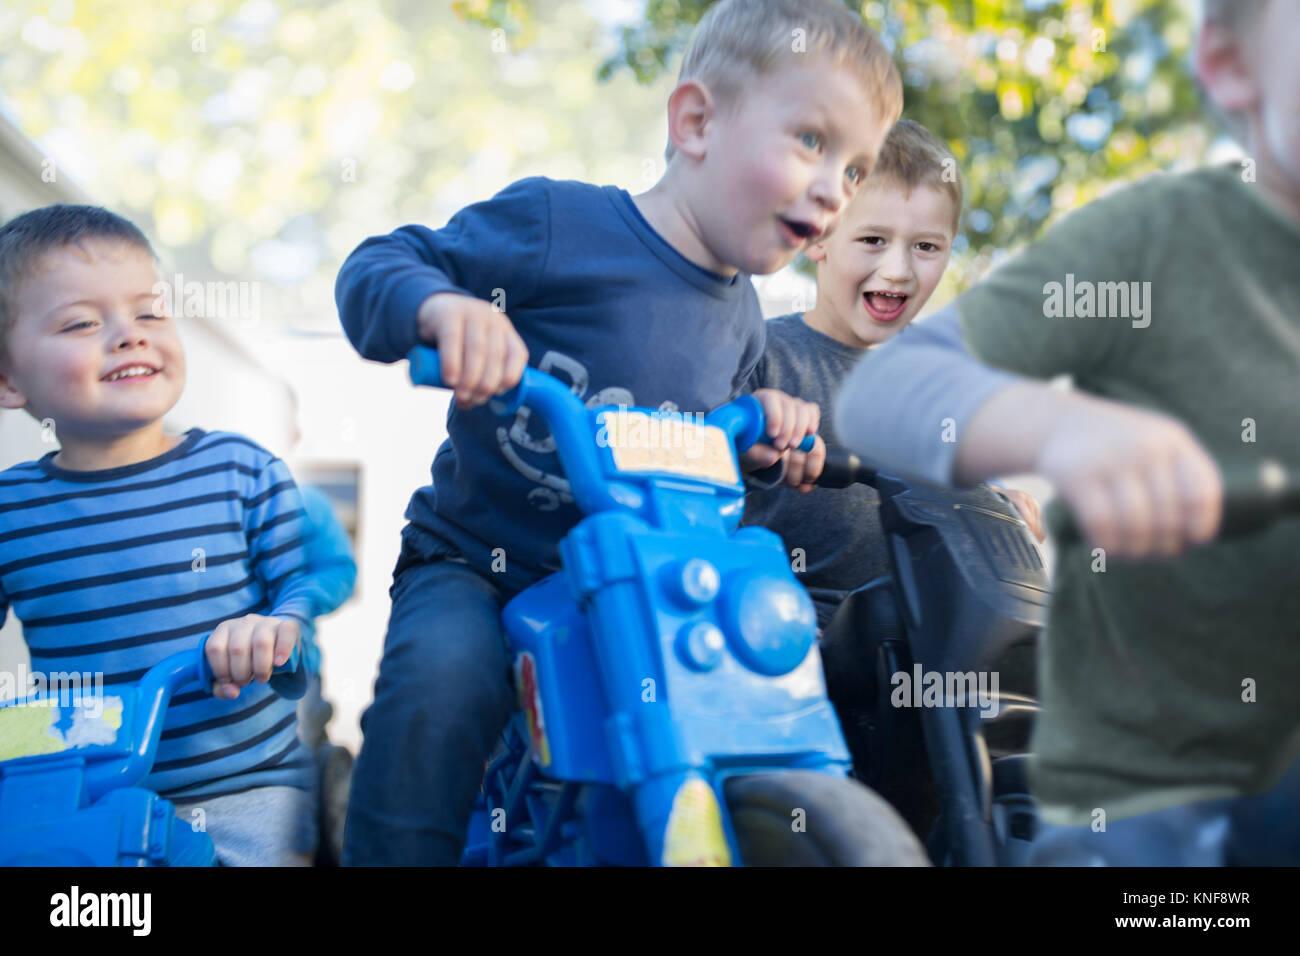 Boys at preschool racing push motorbikes in garden - Stock Image